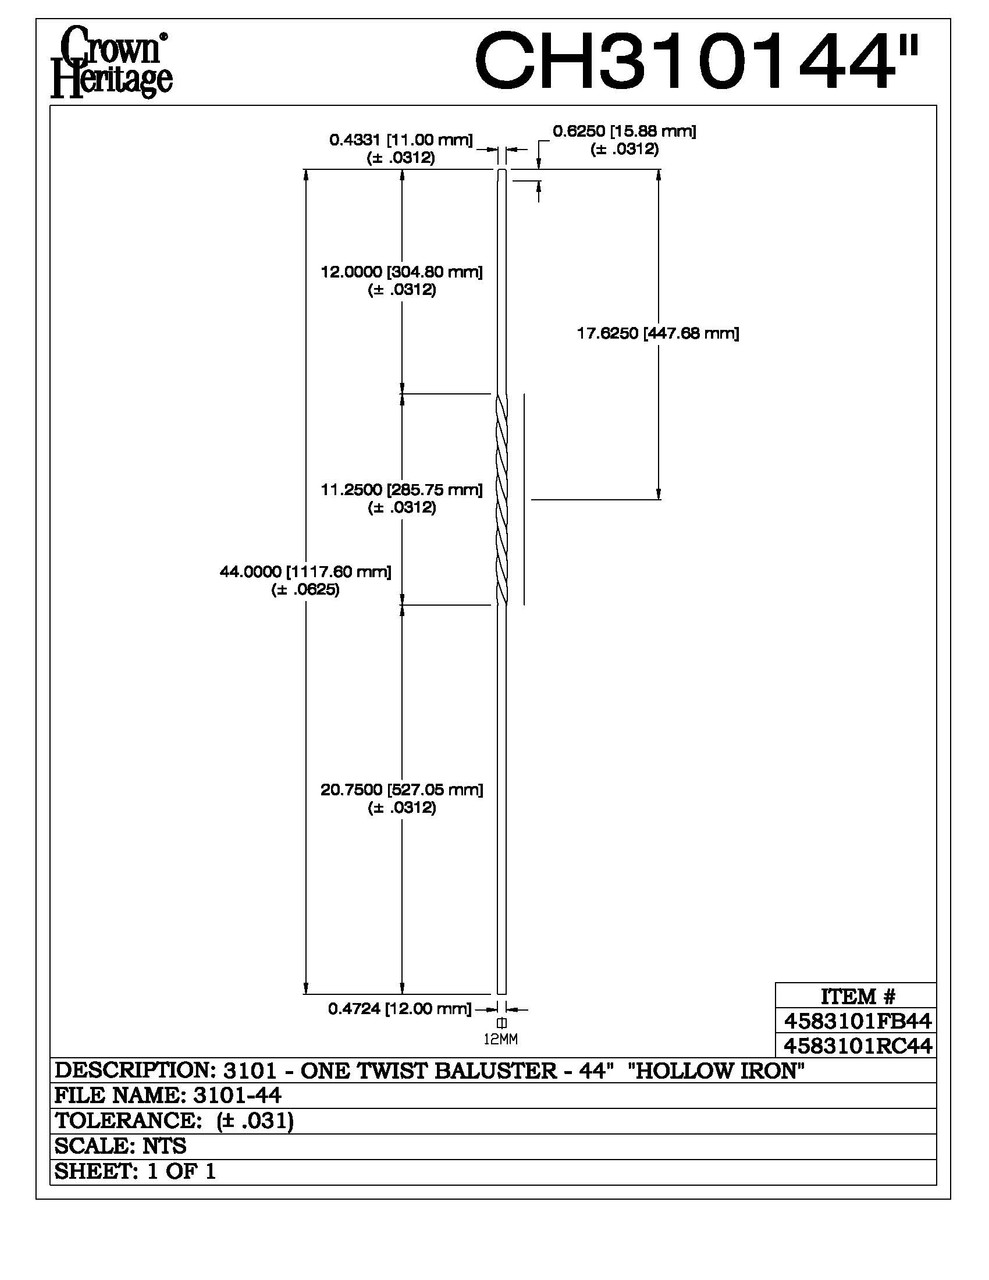 "3101-44 44"" Tubular Steel Single Twist Baluster, CADD DRAWING"